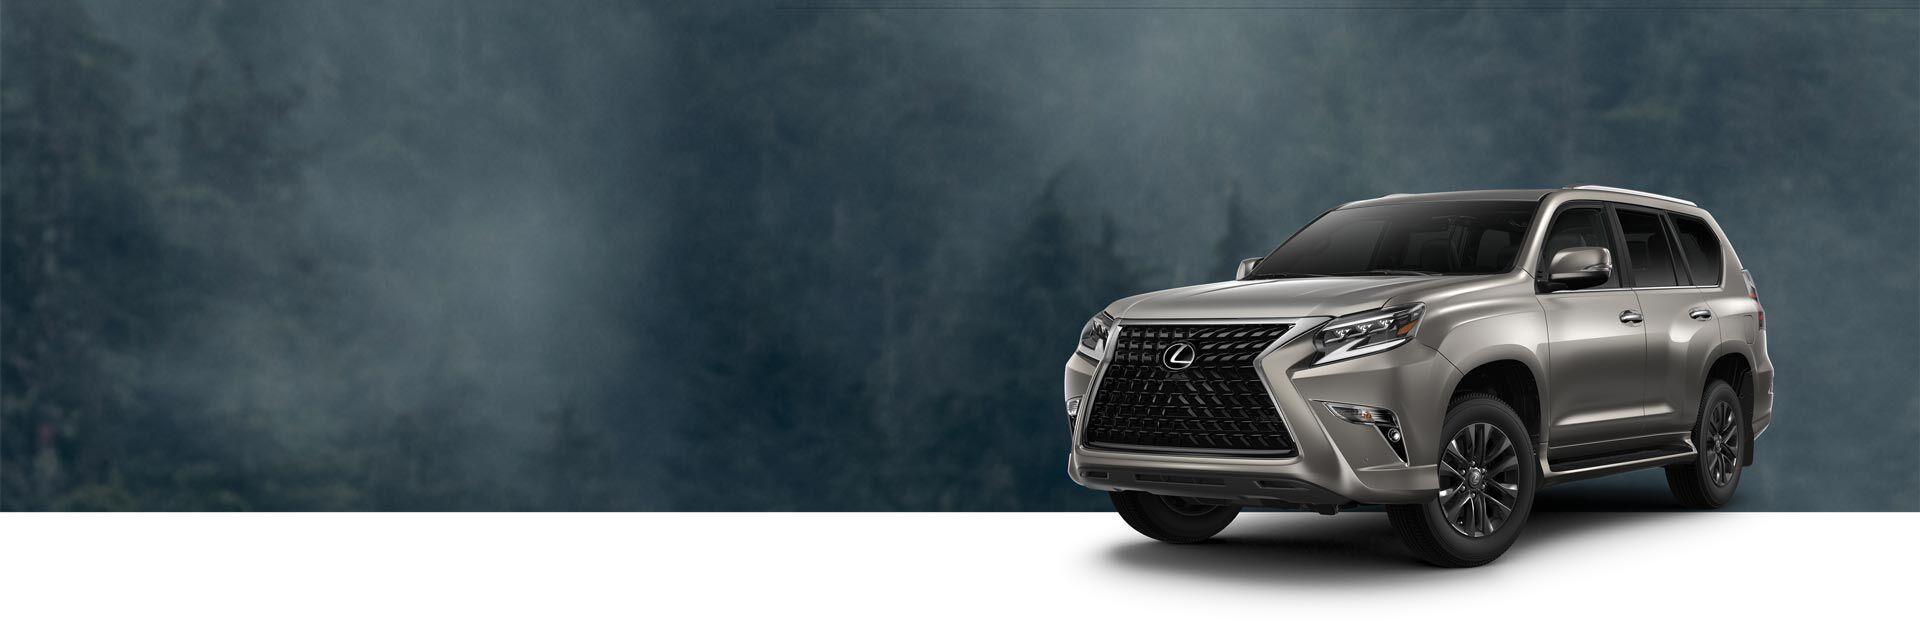 Exterior of the Lexus GX 460 Premium shown in Atomic Silver.